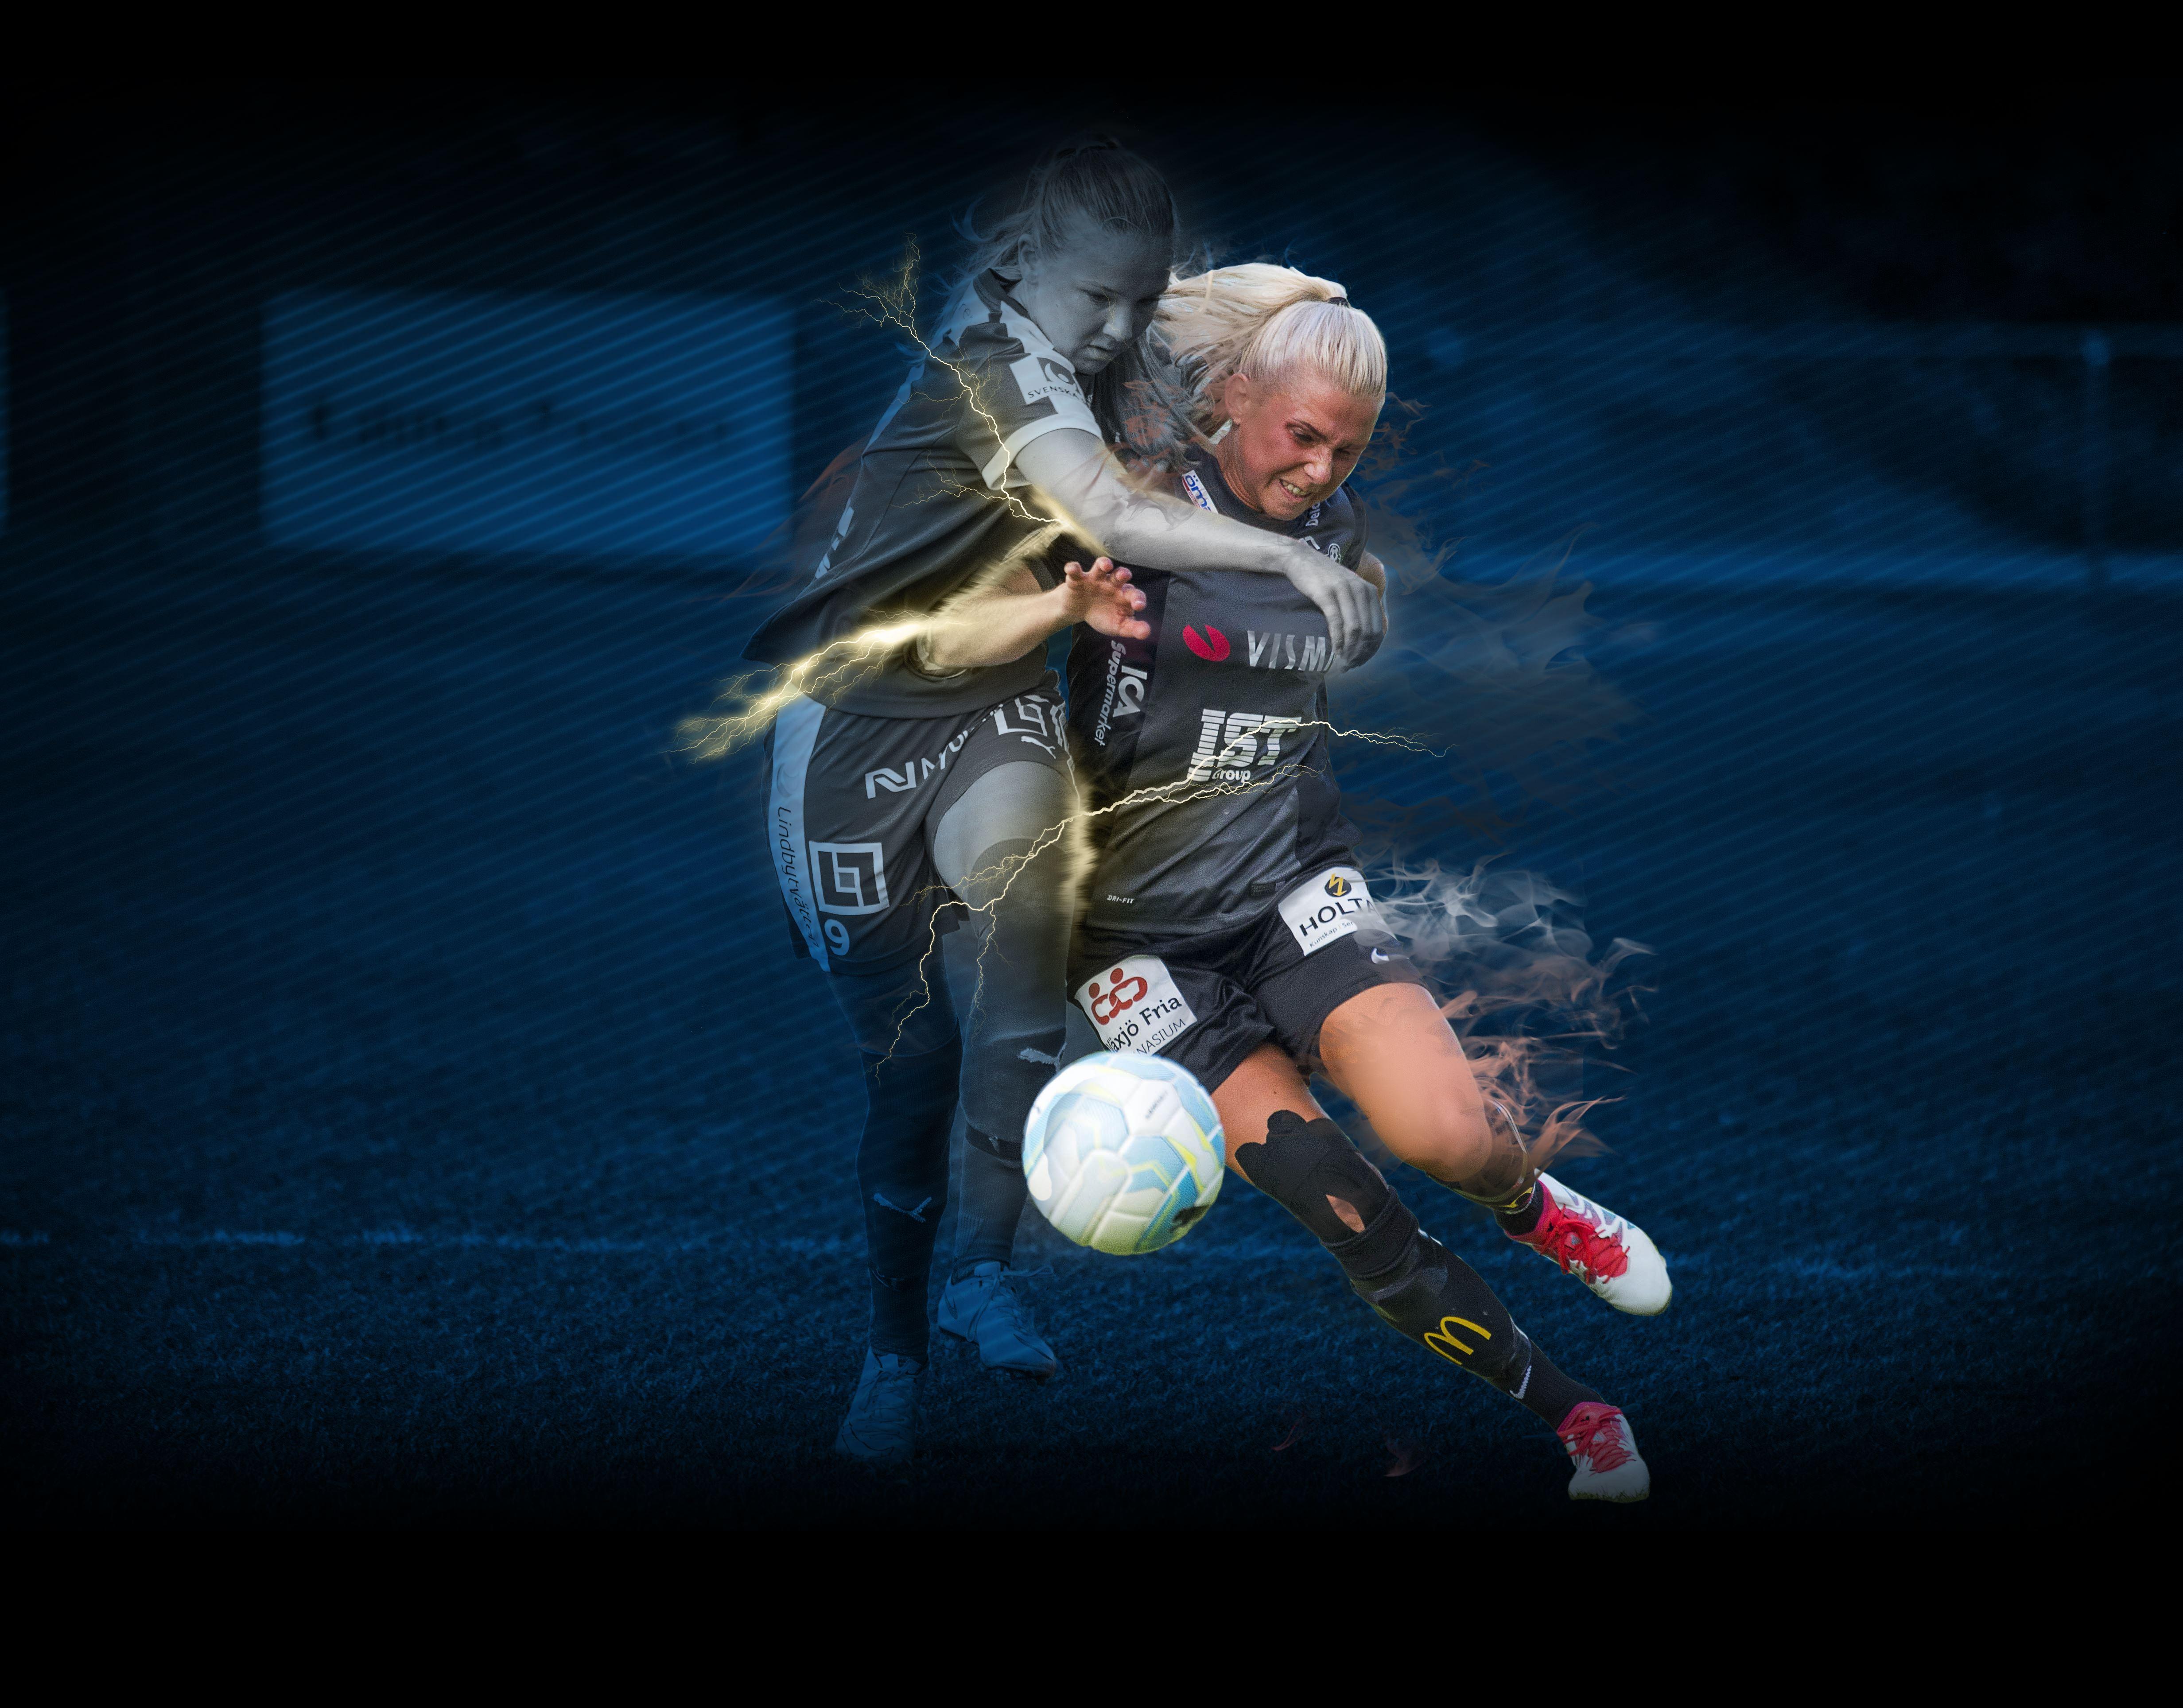 Fotboll: Växjö DFF -Västerås BK 30